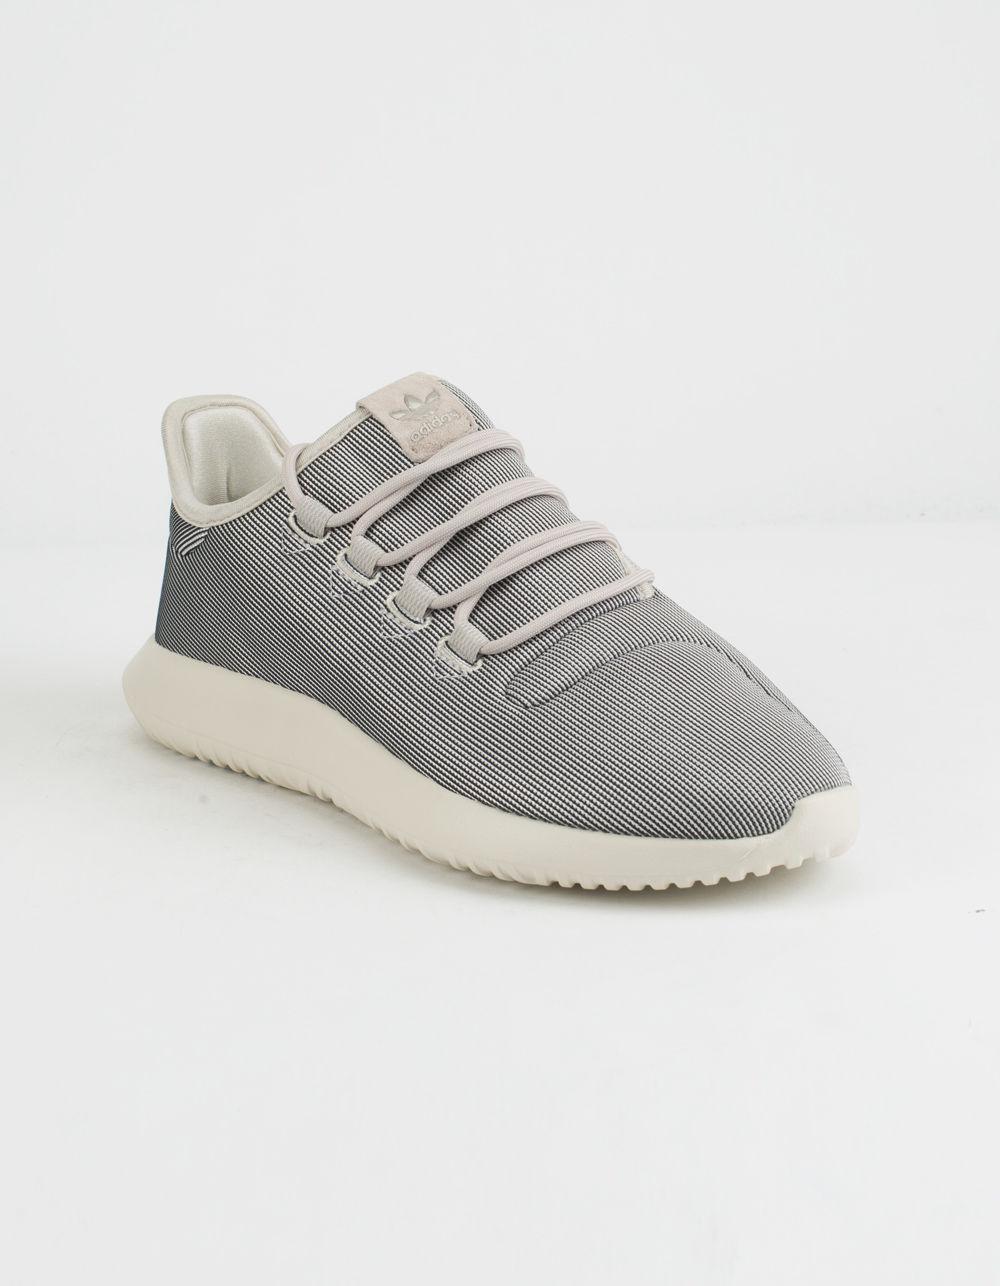 270a5d071538 Lyst - adidas Tubular Shadow Platinum Metallic Womens Shoes in Gray